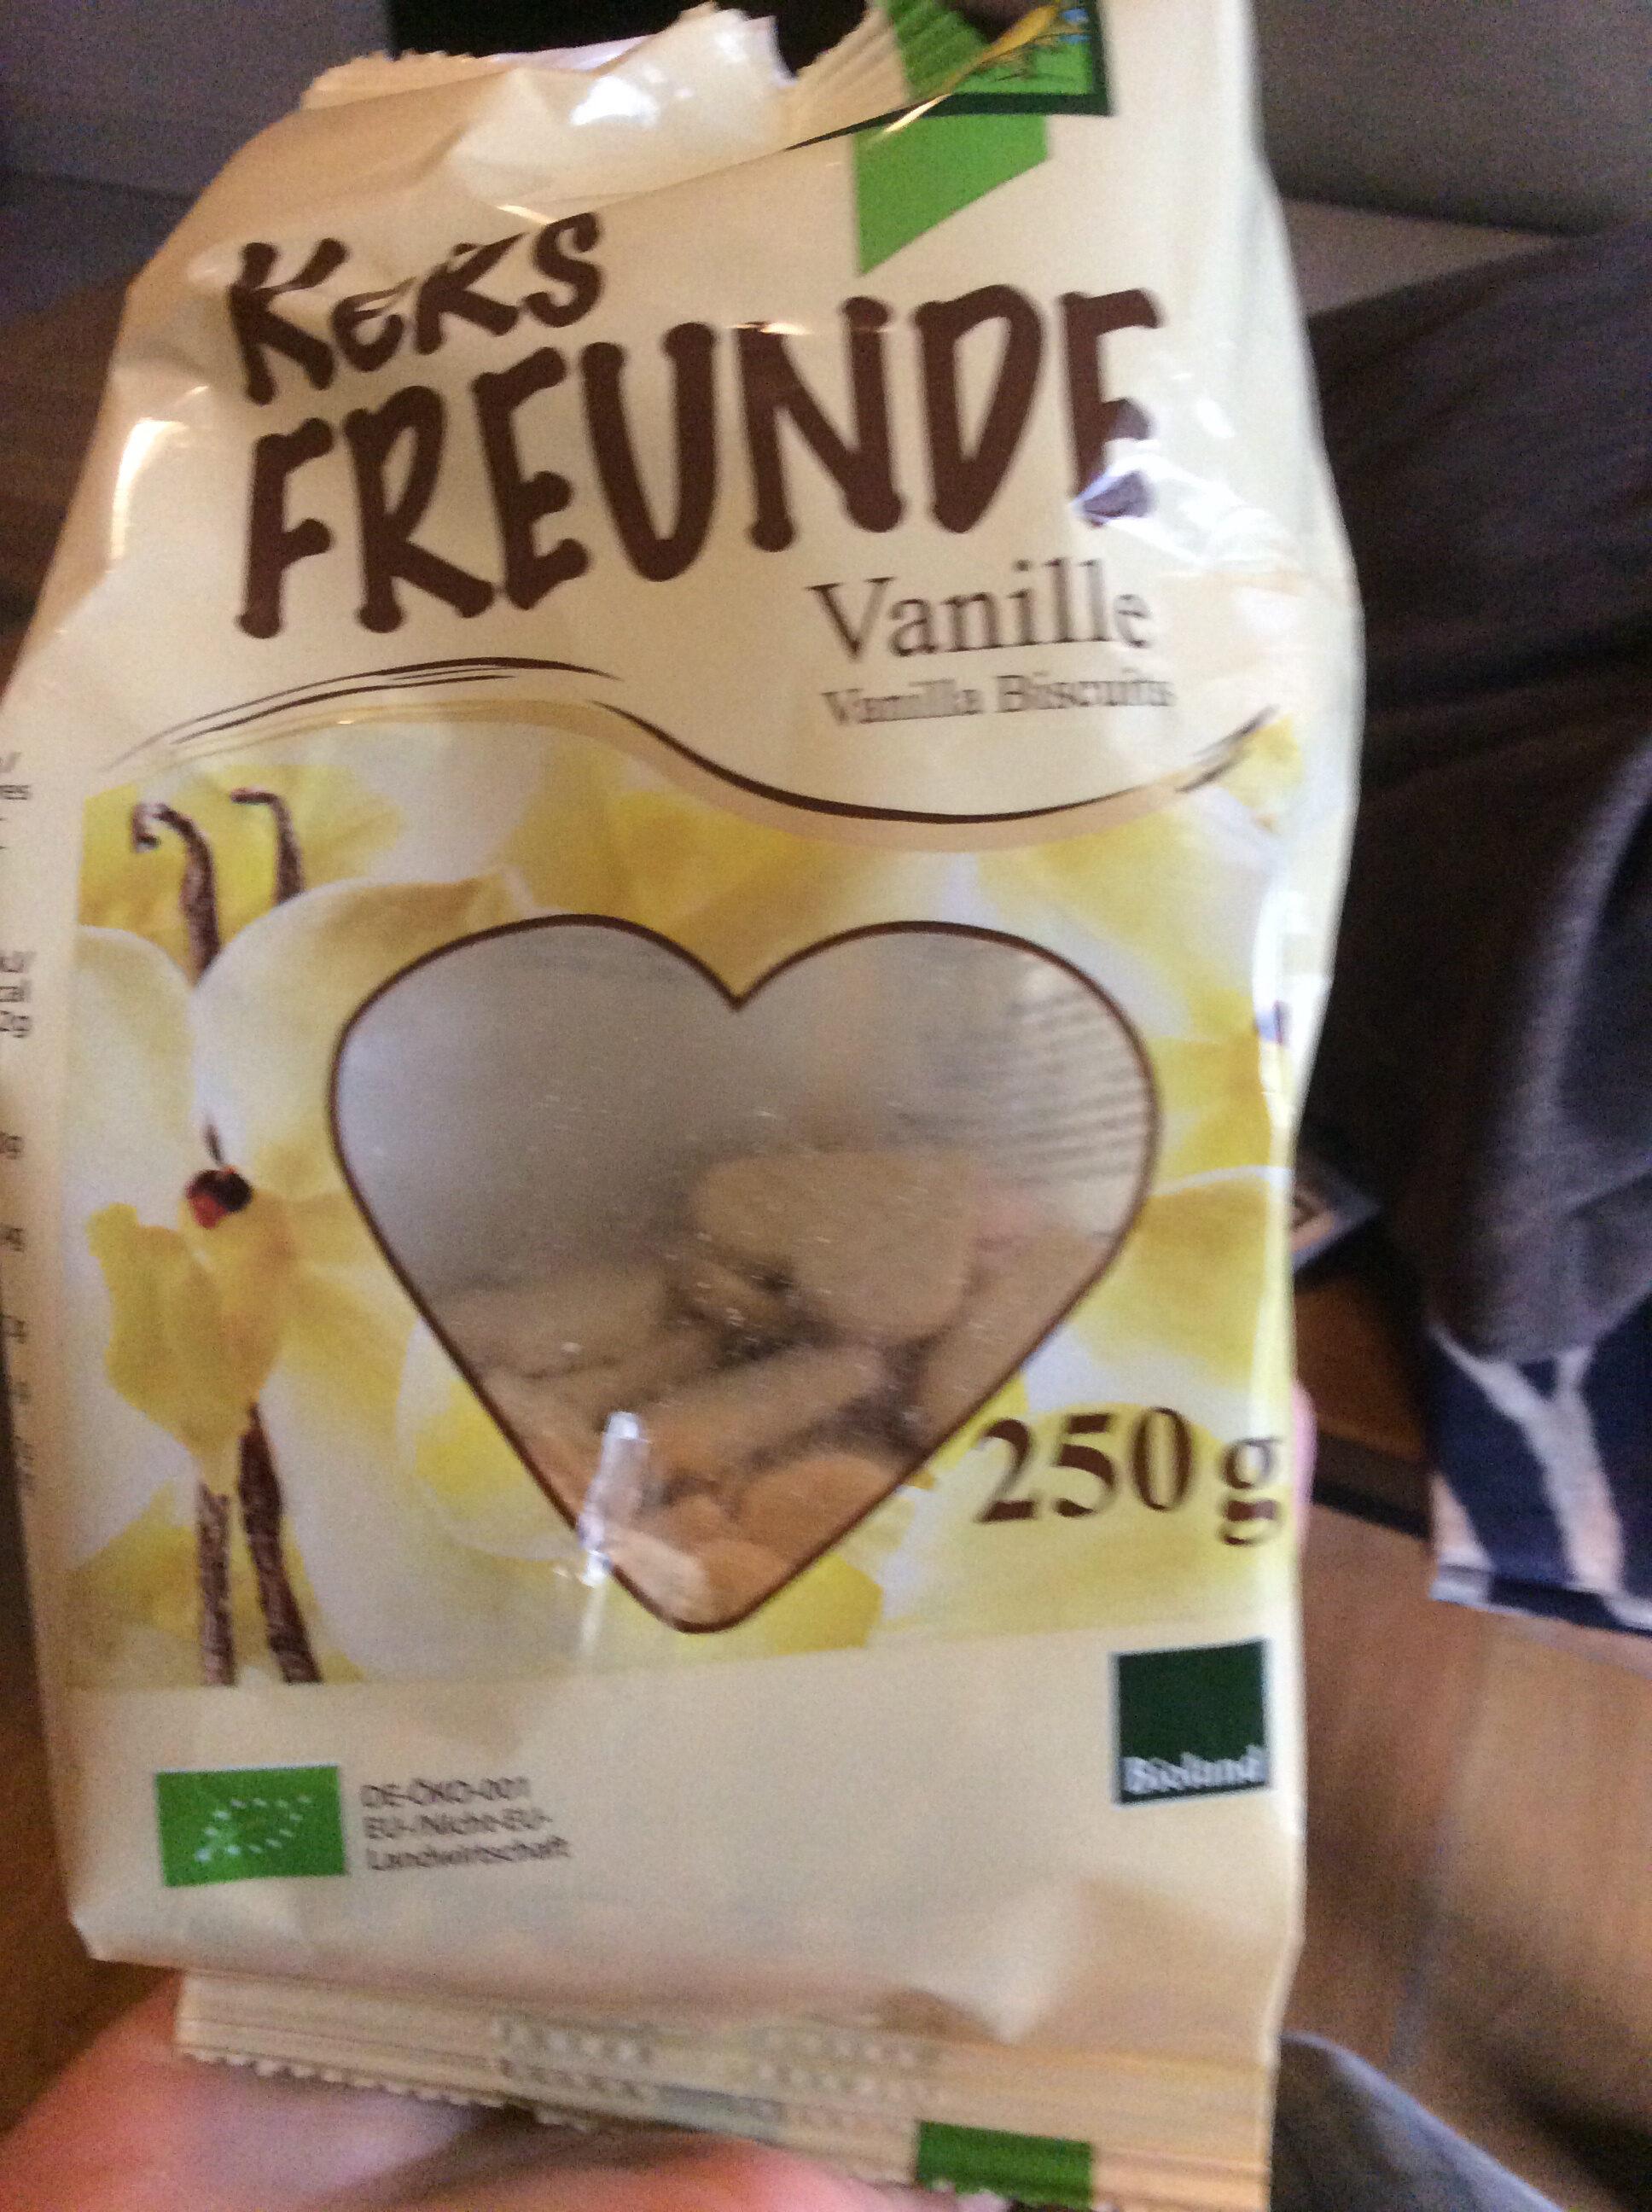 Keks Freunde Vanille - Produit - fr